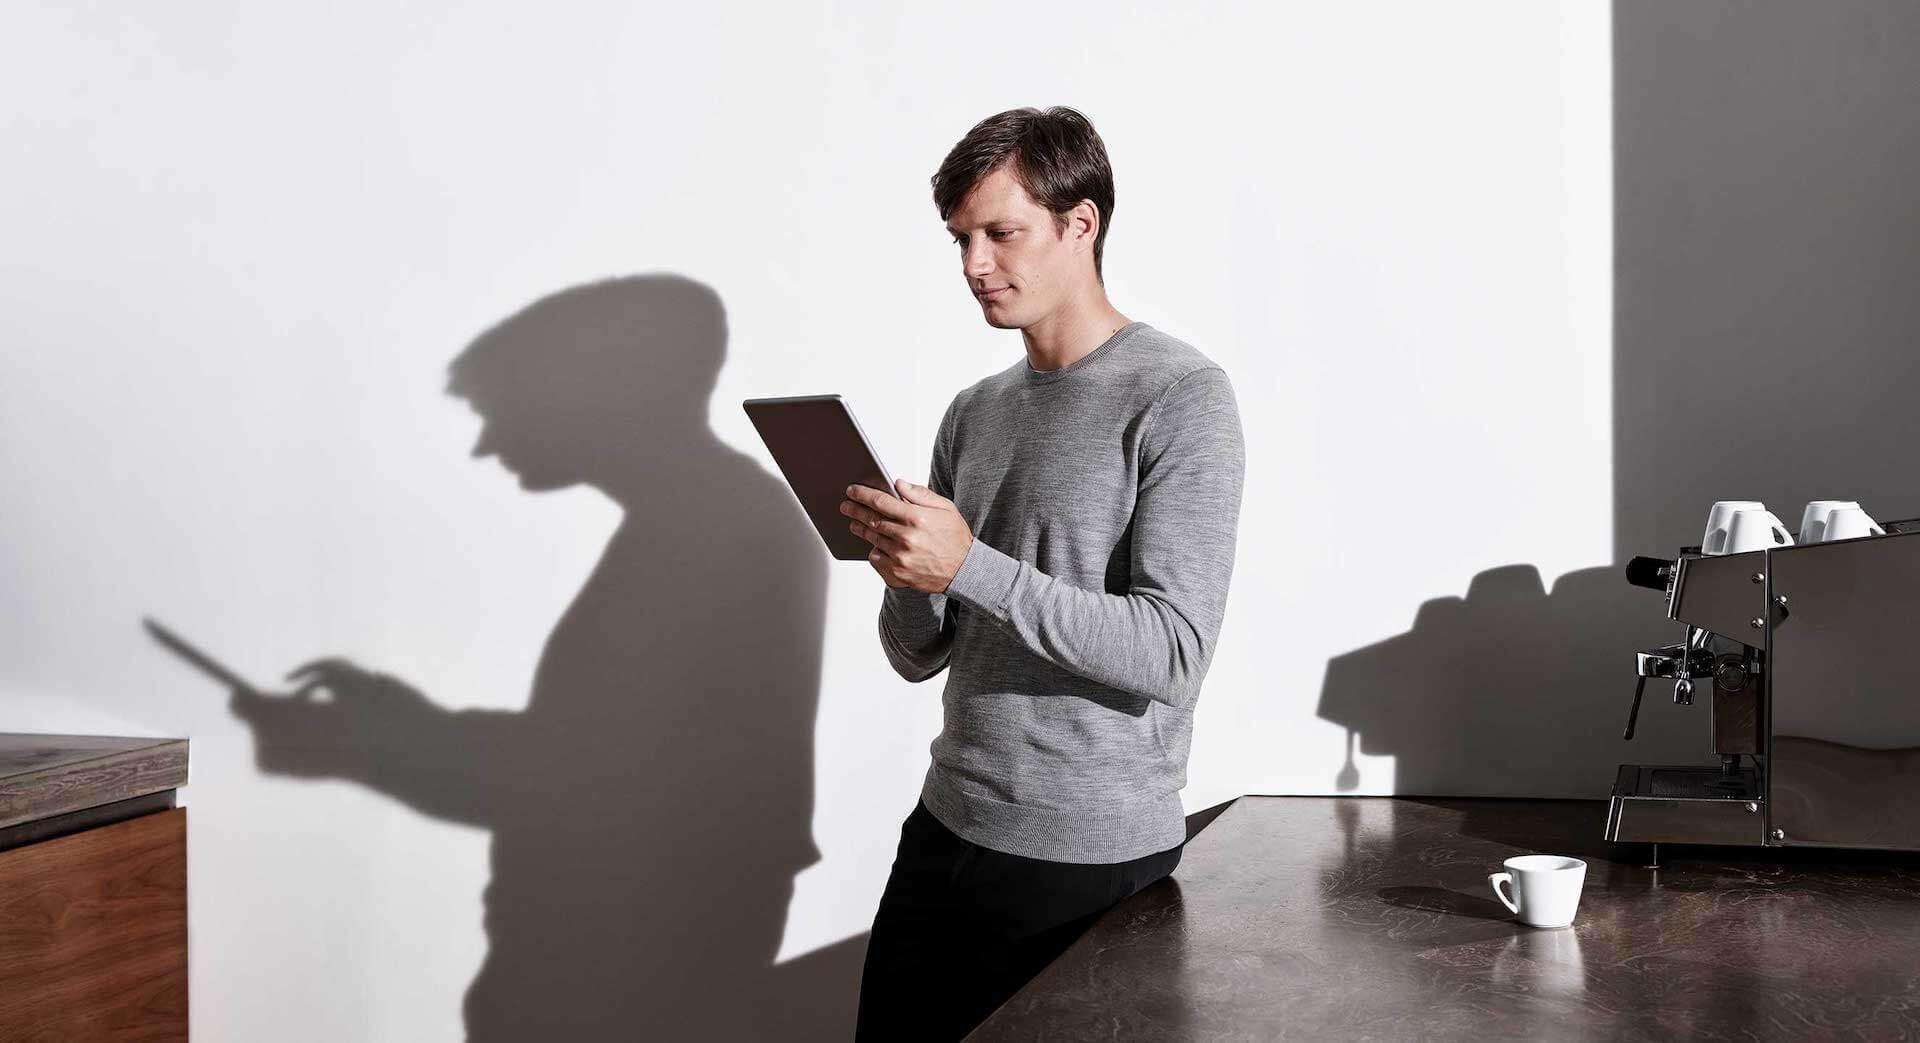 Gira People Tablet Guy